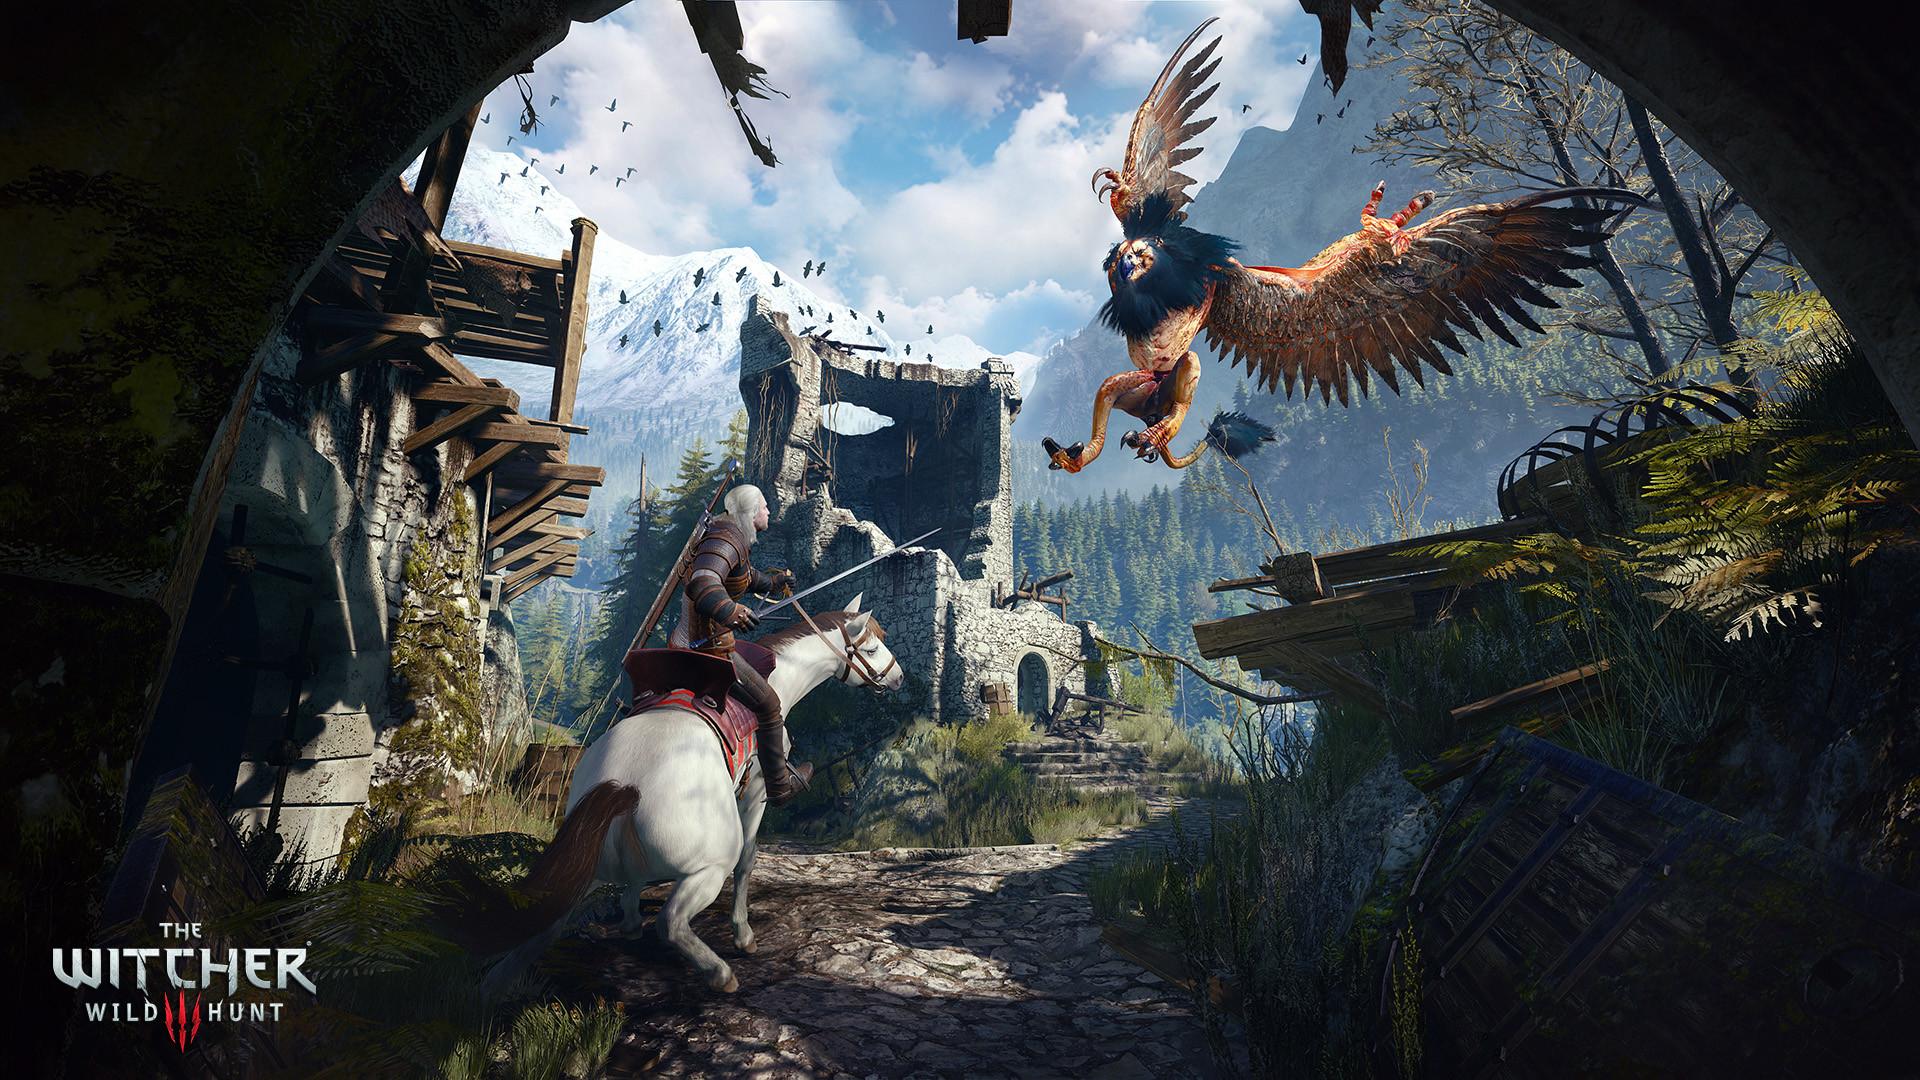 … video game the witcher 3 wild hunt wallpapers desktop phone …